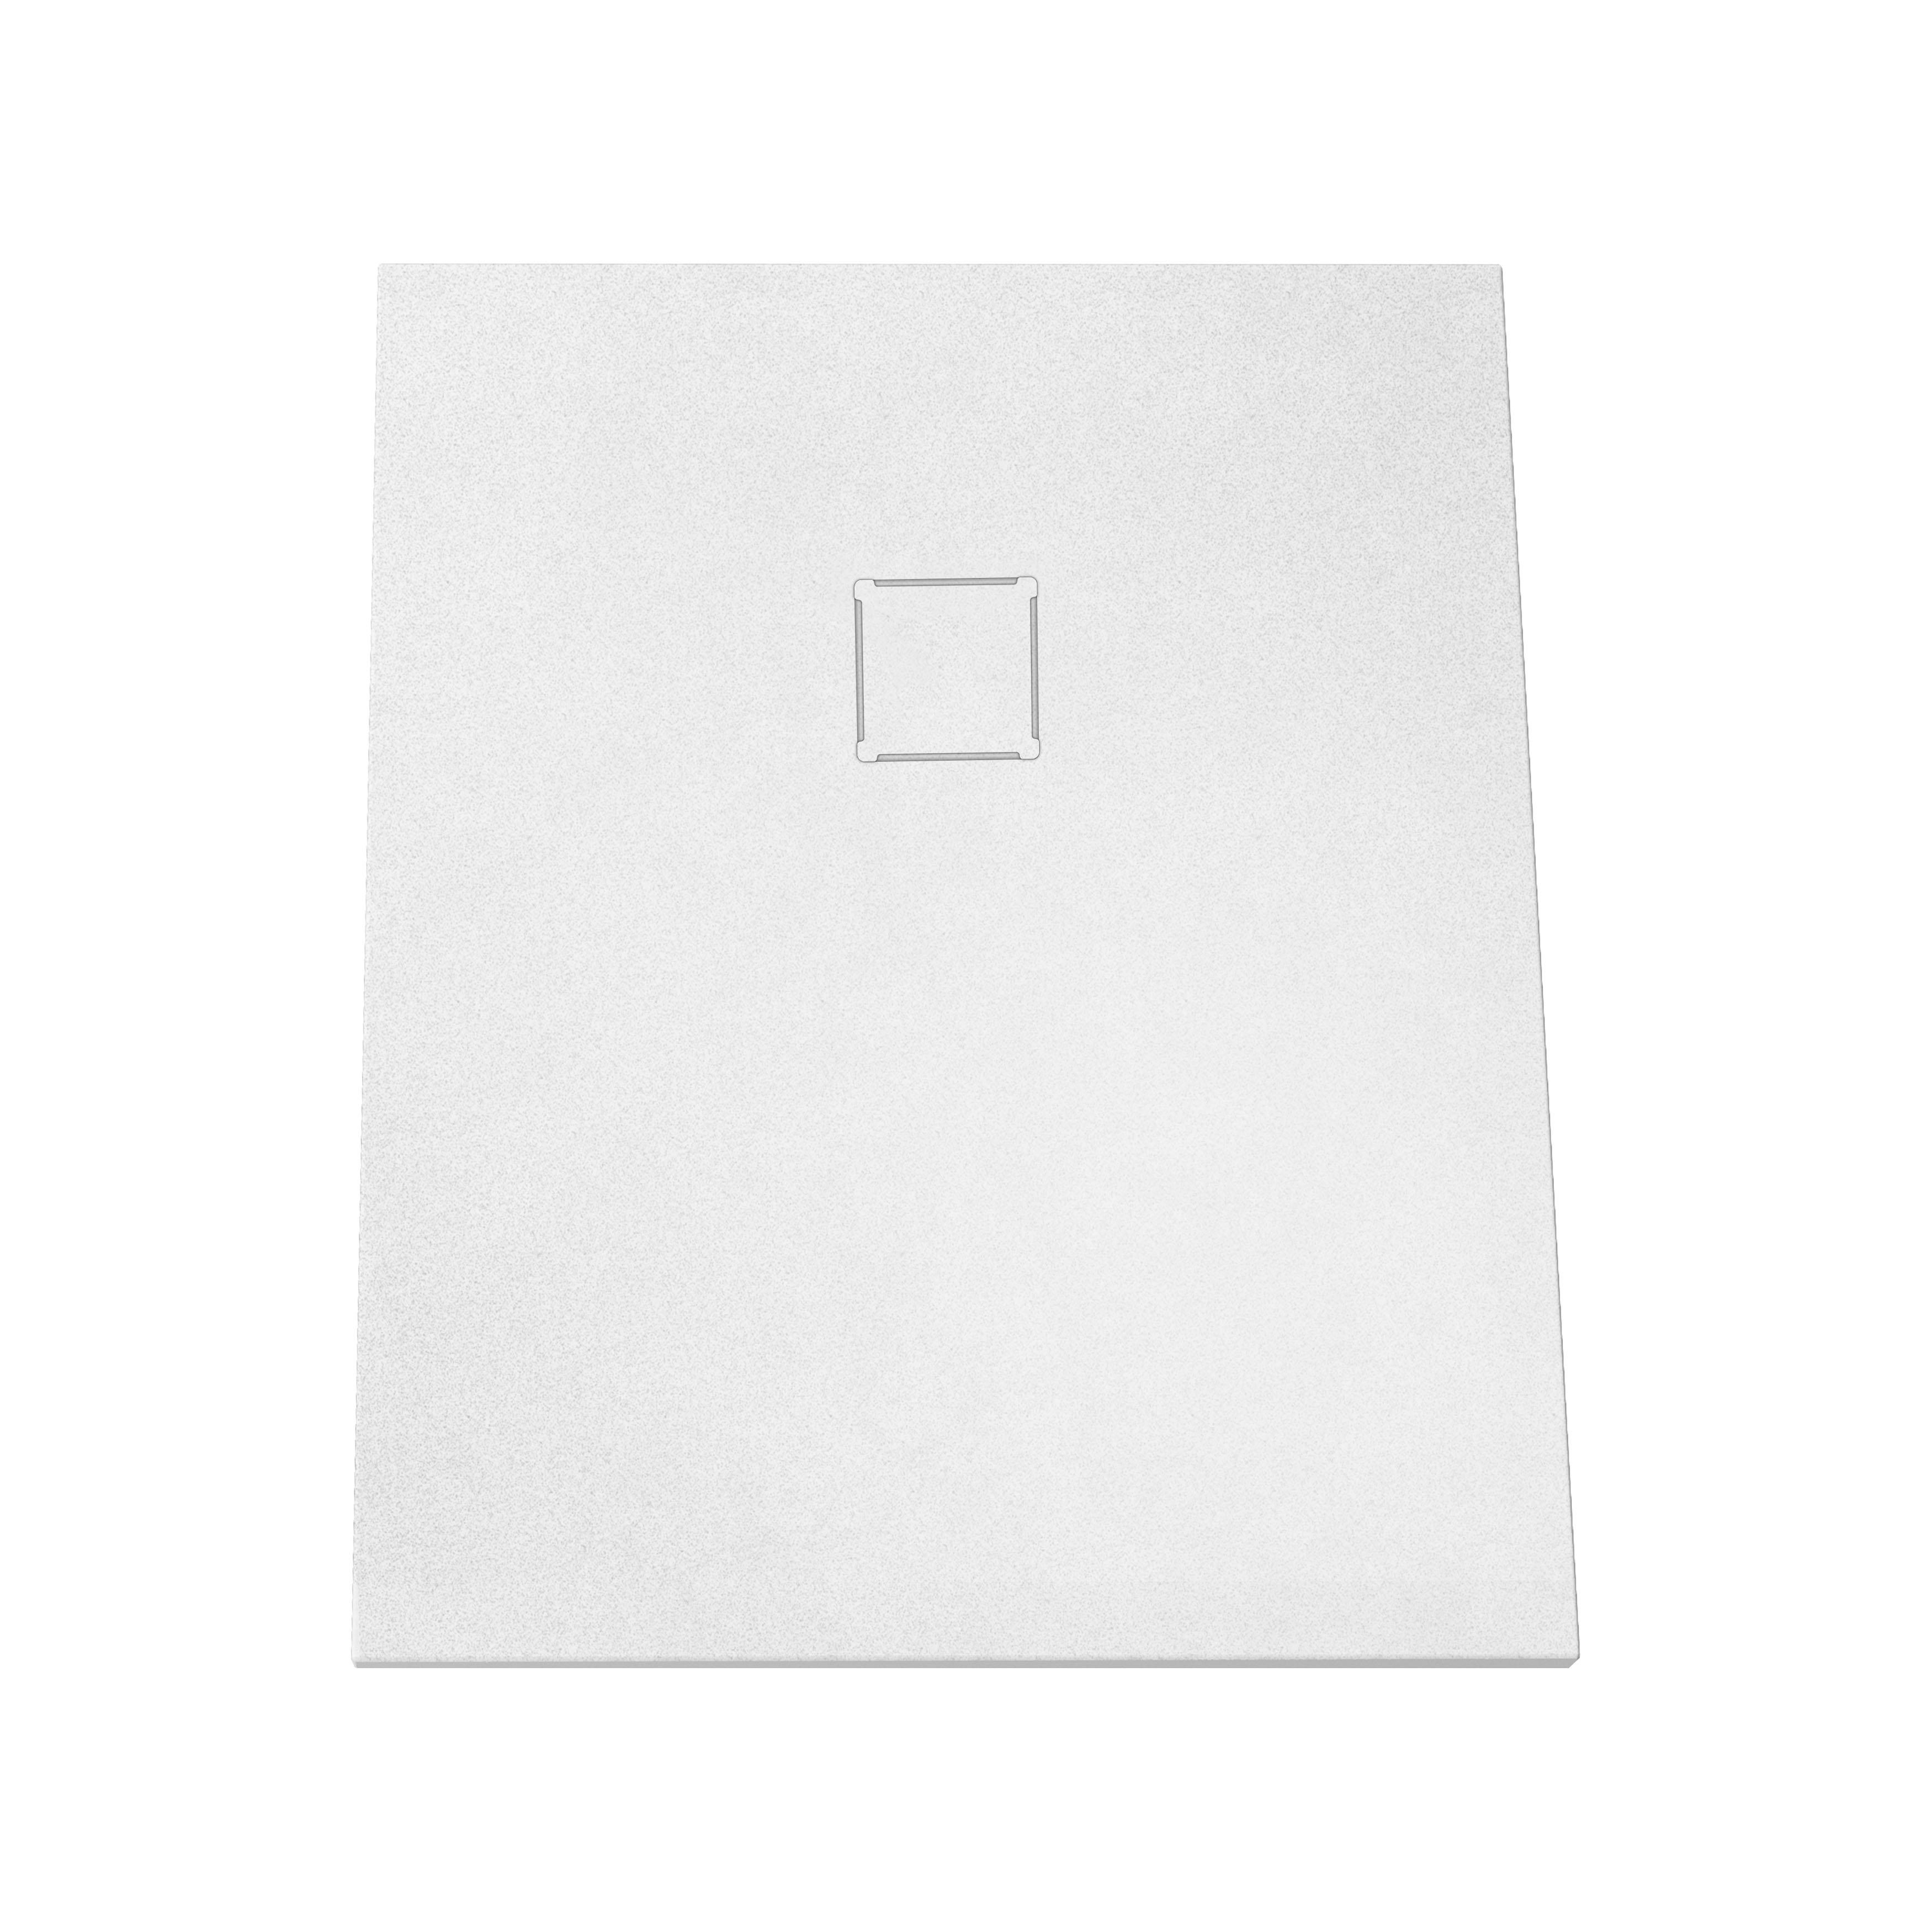 V-stone, receveur ultra plat en solid stone, 100  x  70 cm, blanc